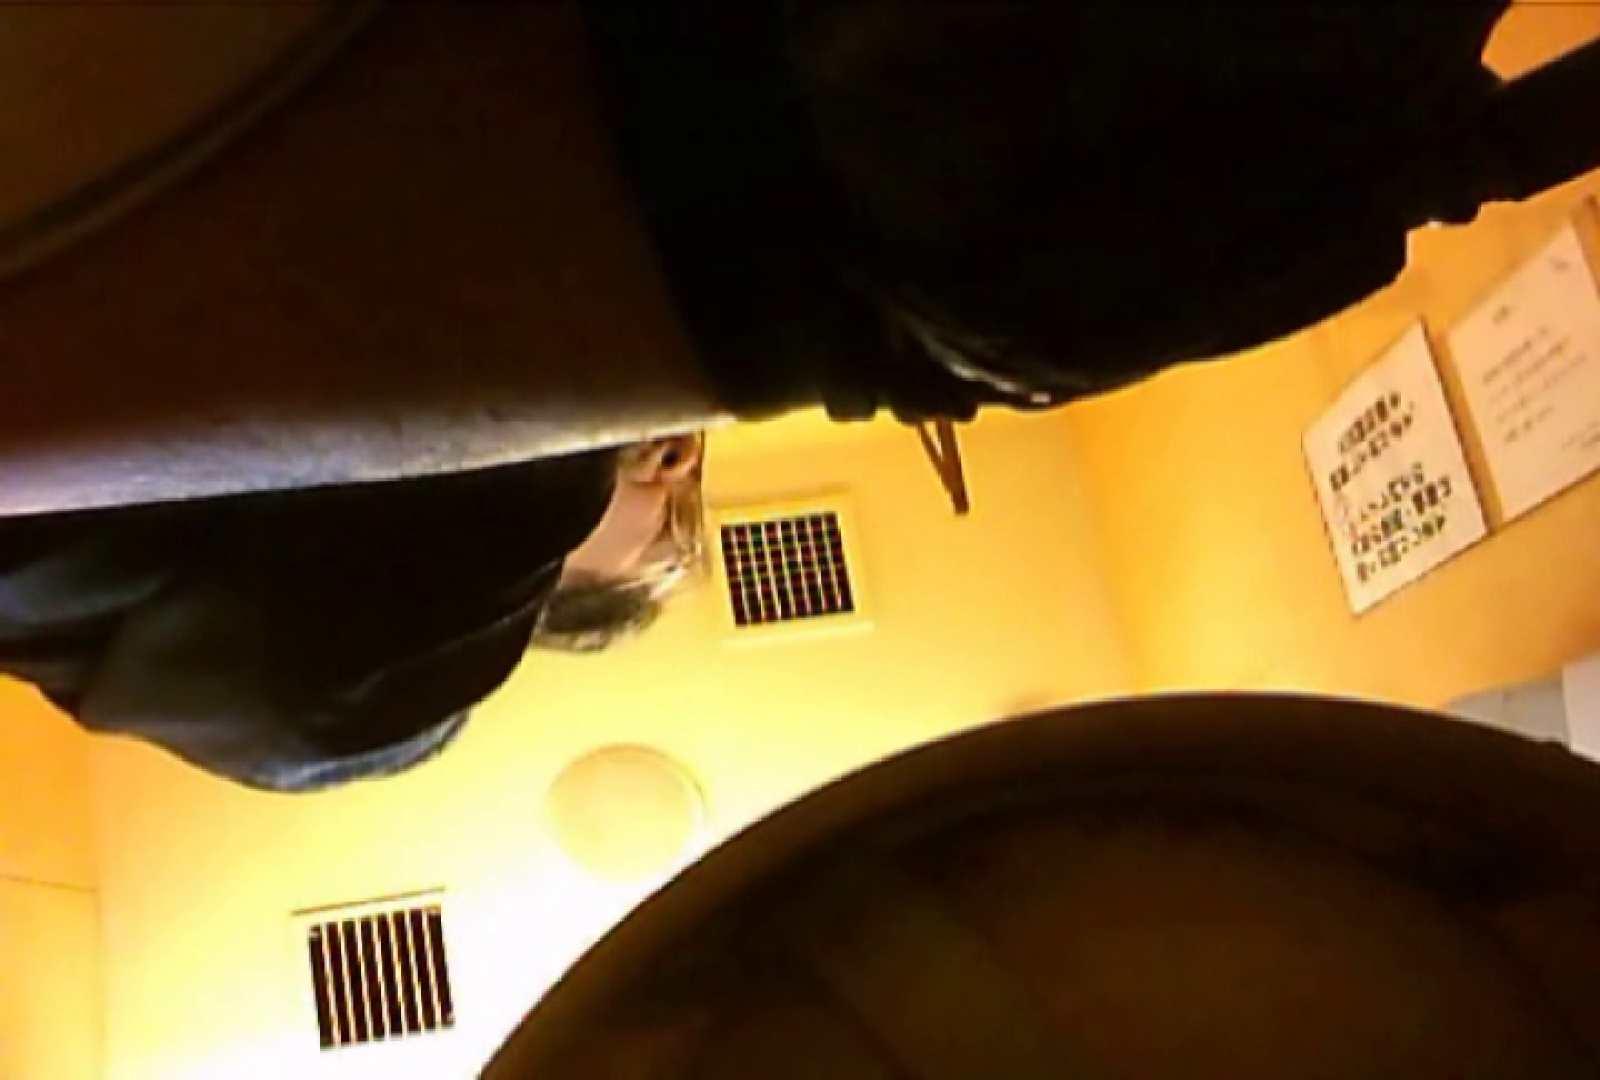 SEASON 2ND!掴み取りさんの洗面所覗き!in新幹線!VOL.02 スーツボーイズ | ノンケボーイズ  82pic 7